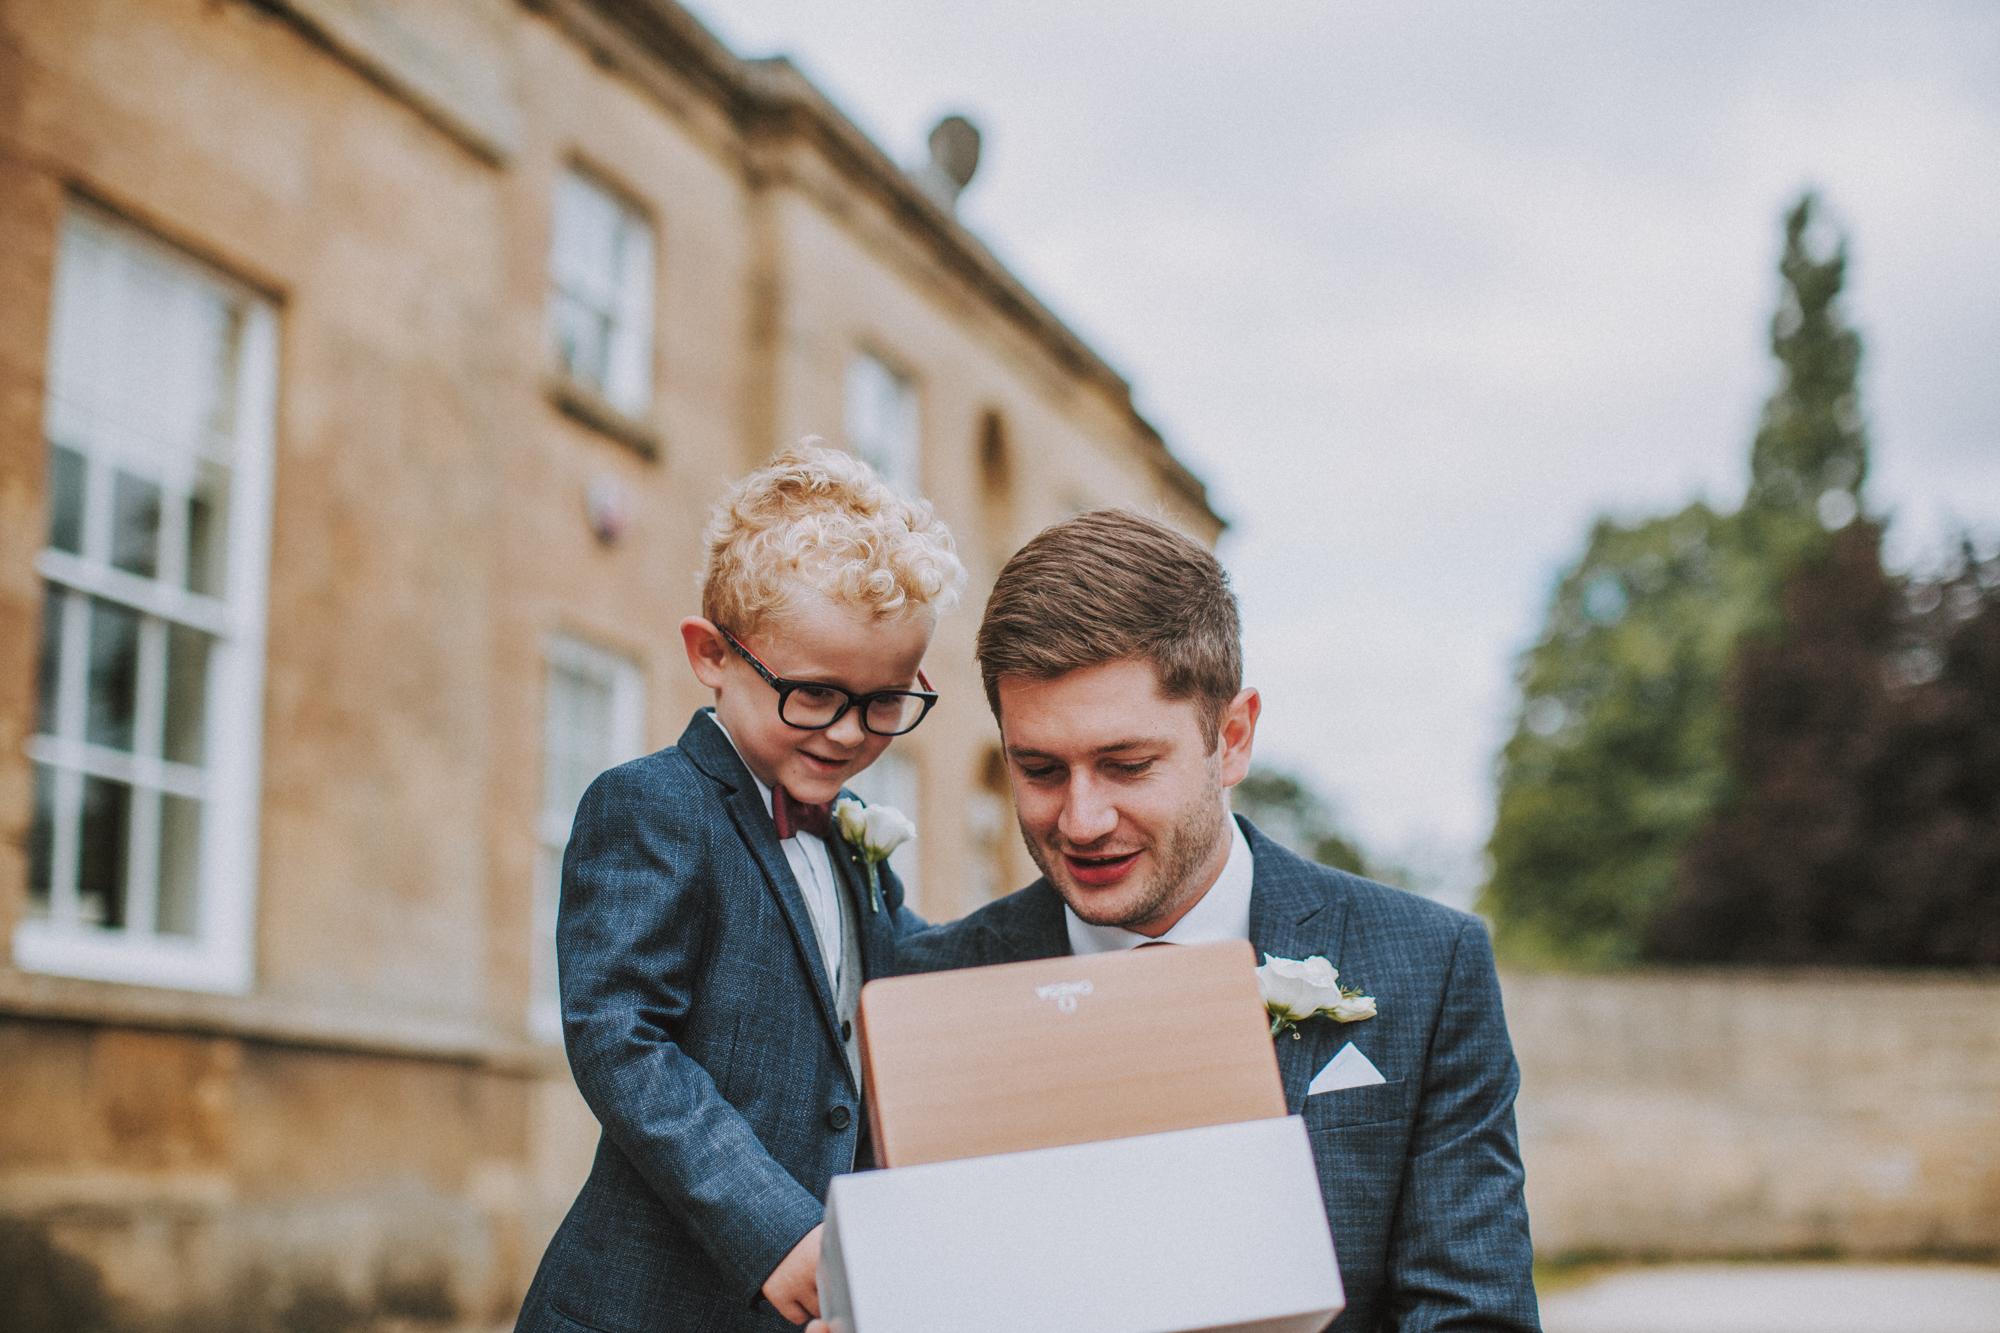 bowcliffe hall wedding photographers yorkshire-13.jpg